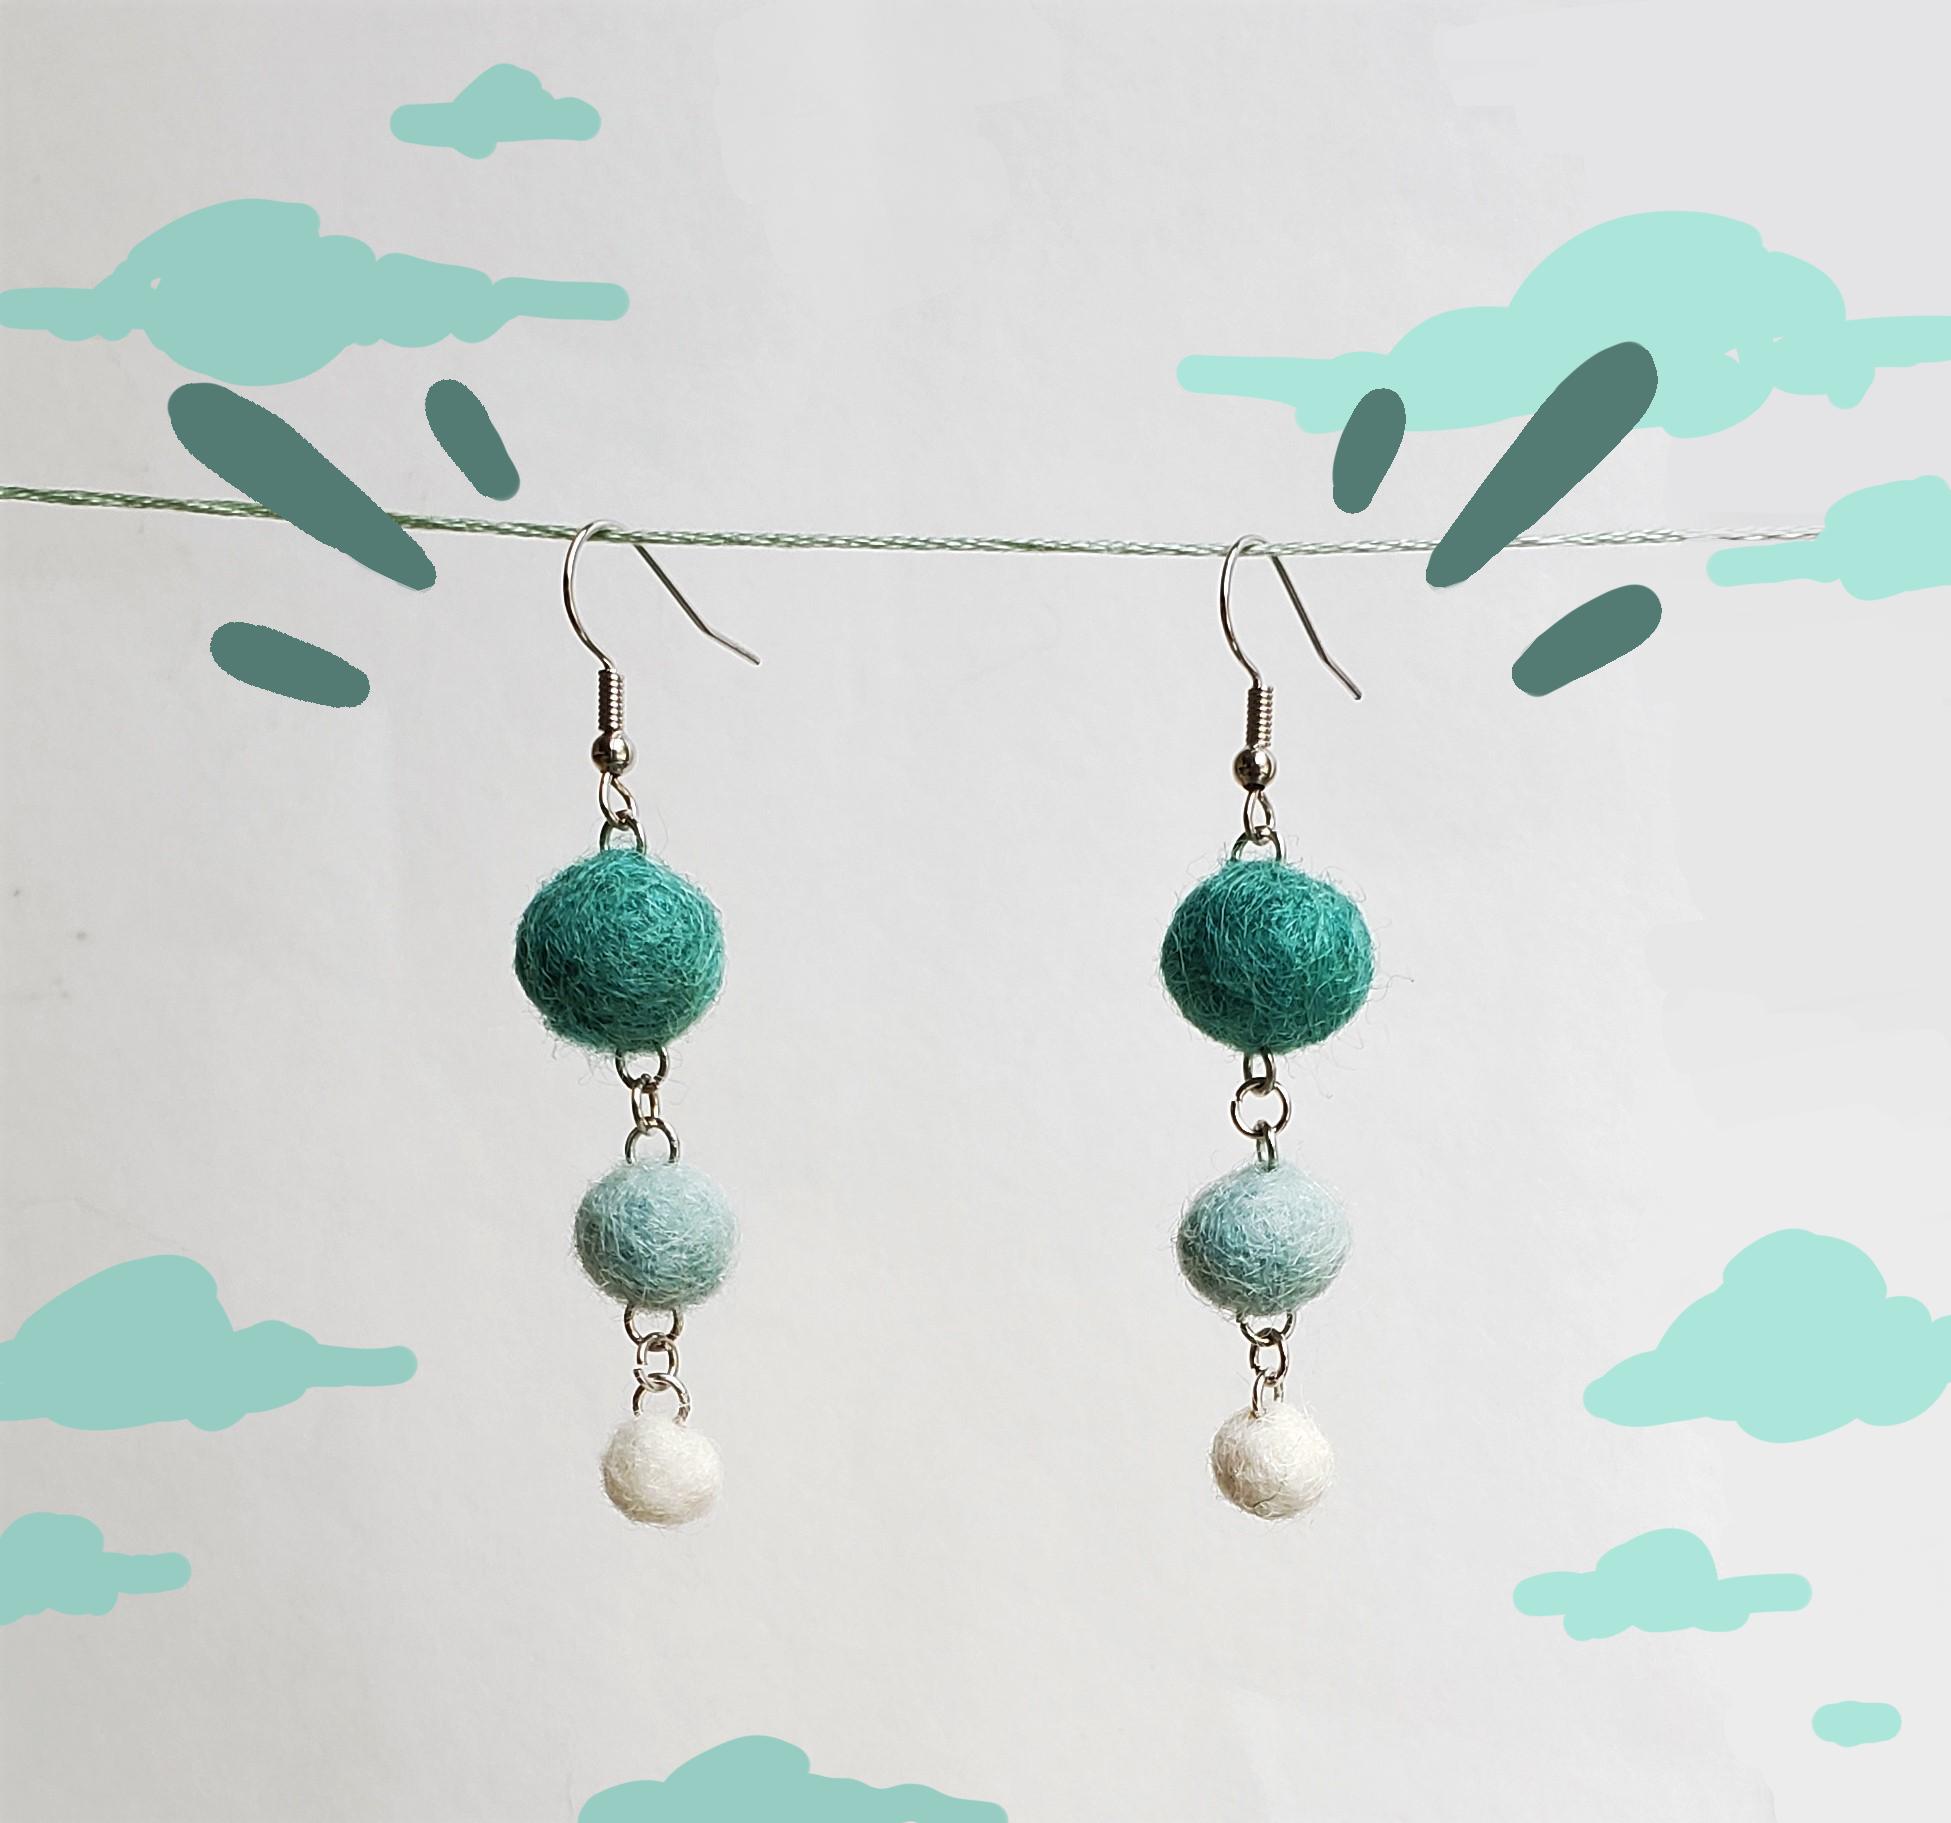 Image 5 - Felted ball earrings